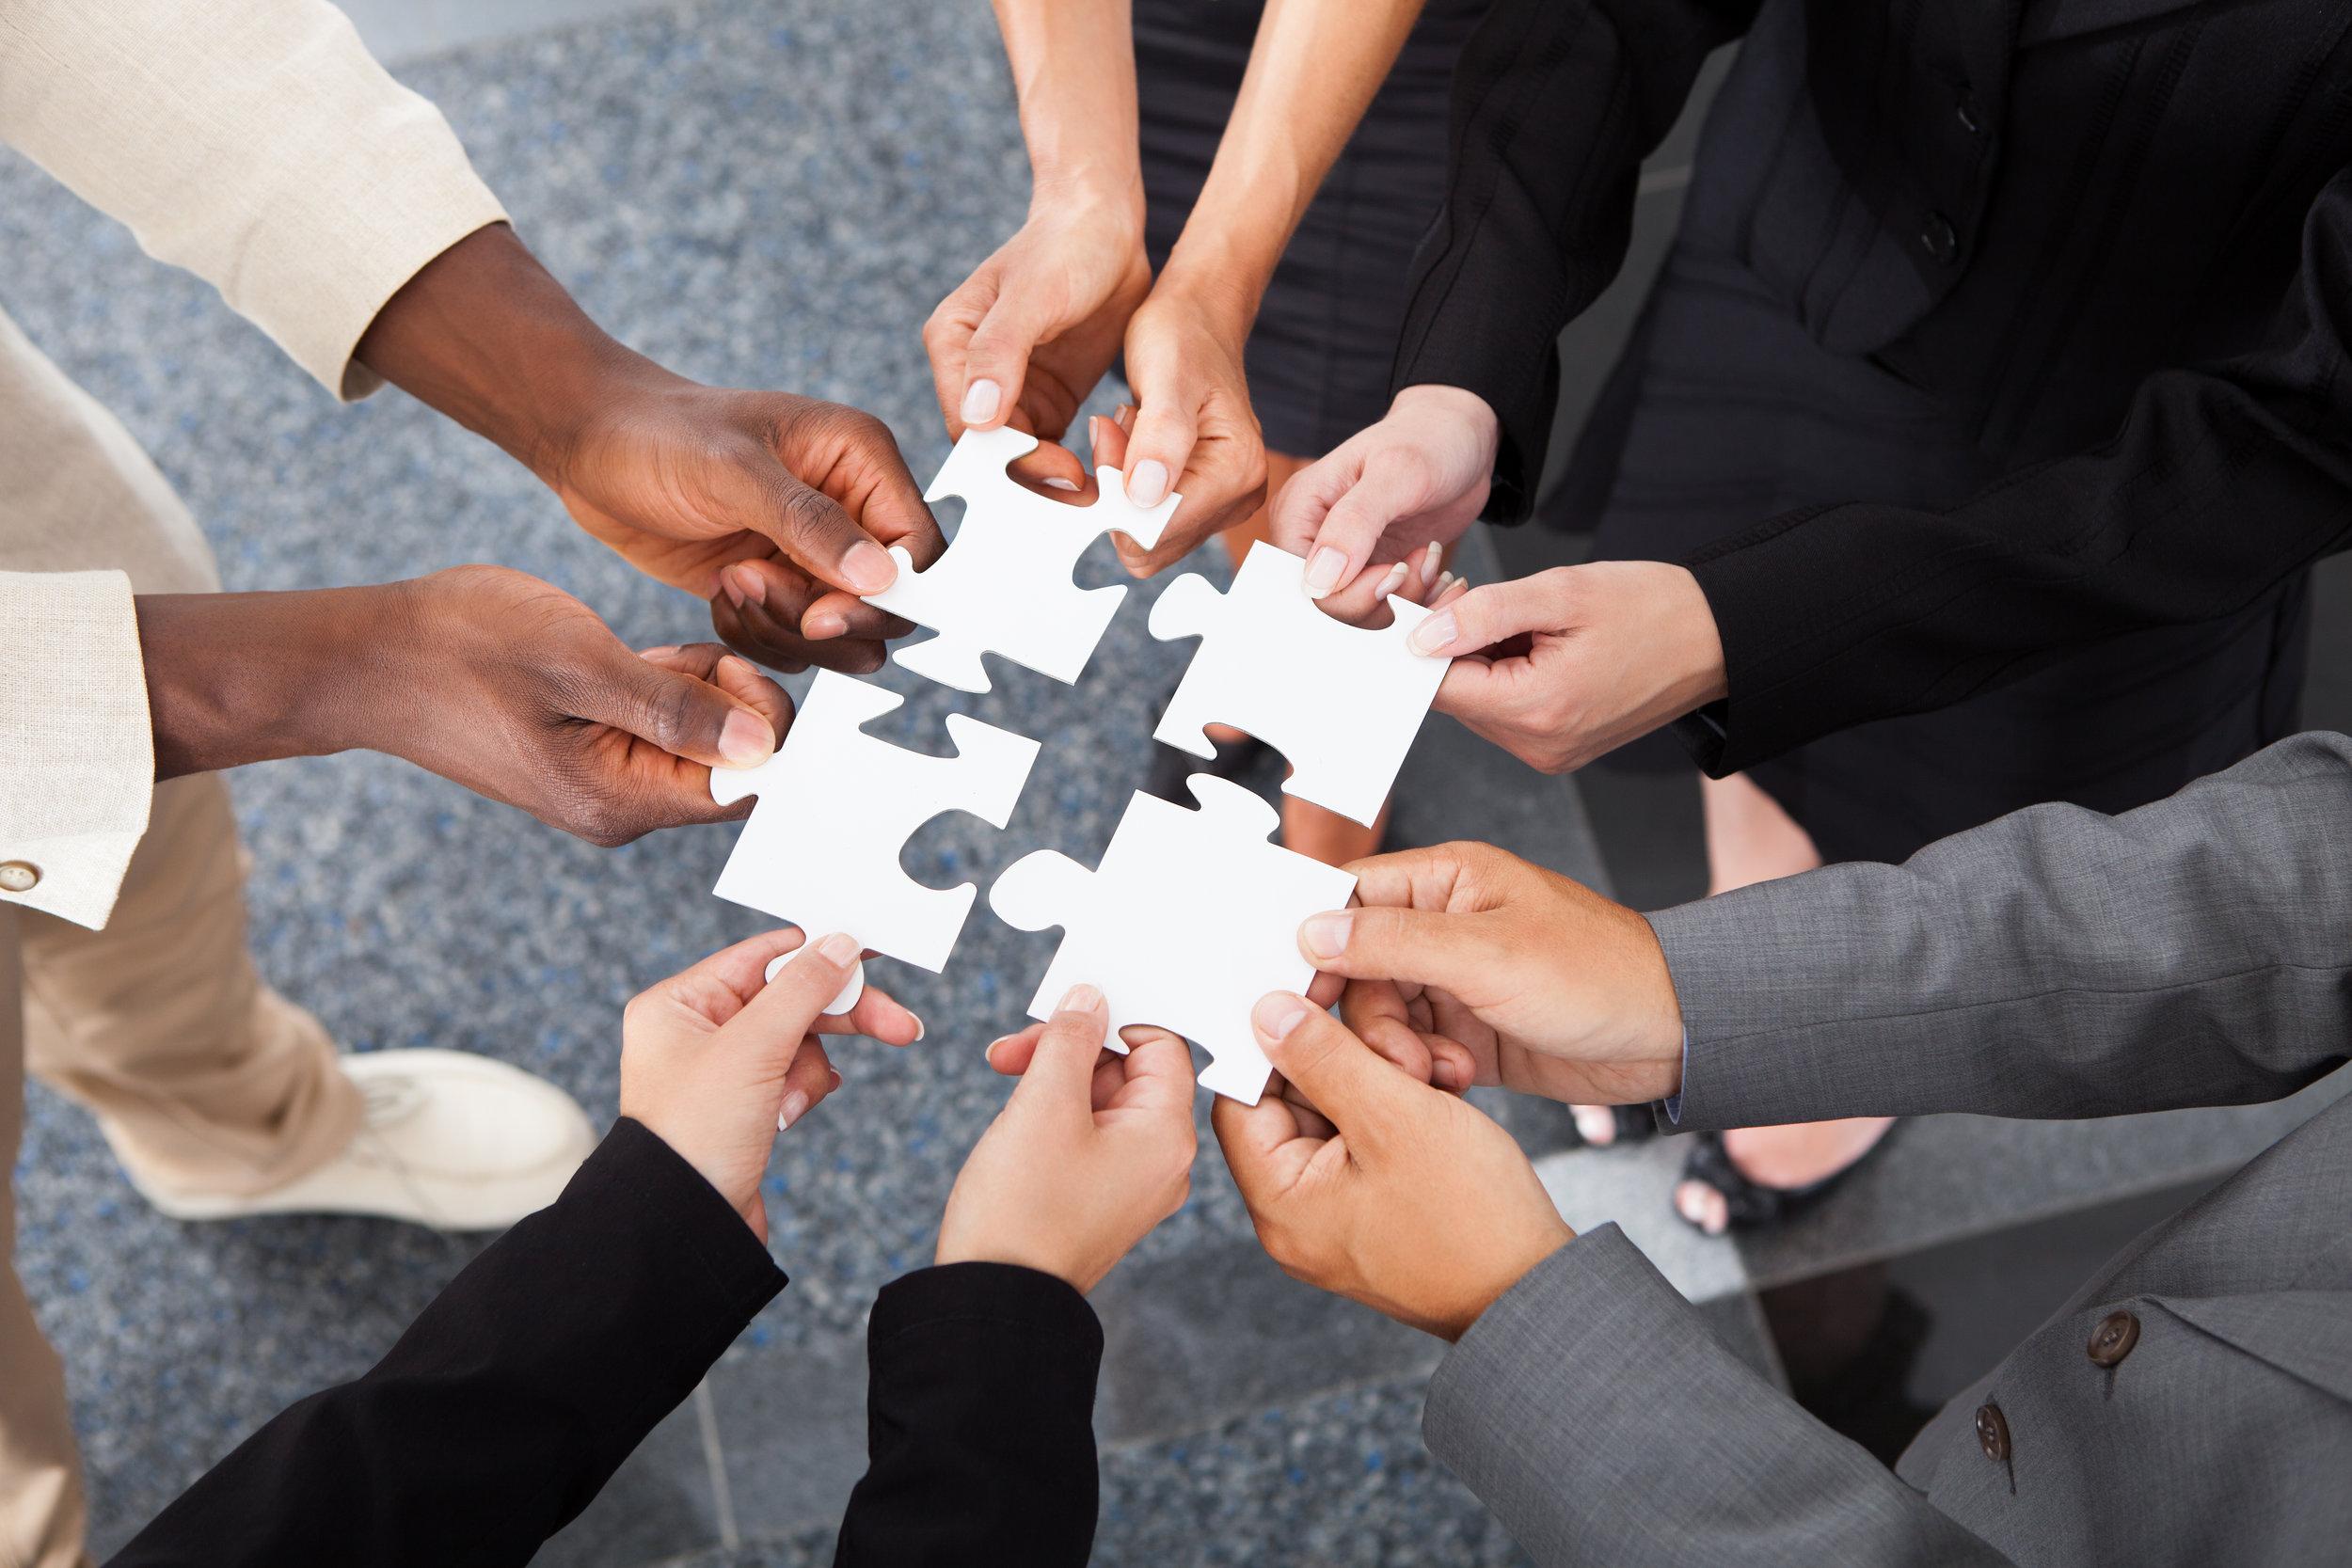 group_puzzle_piecesshutterstock_150243626.jpg